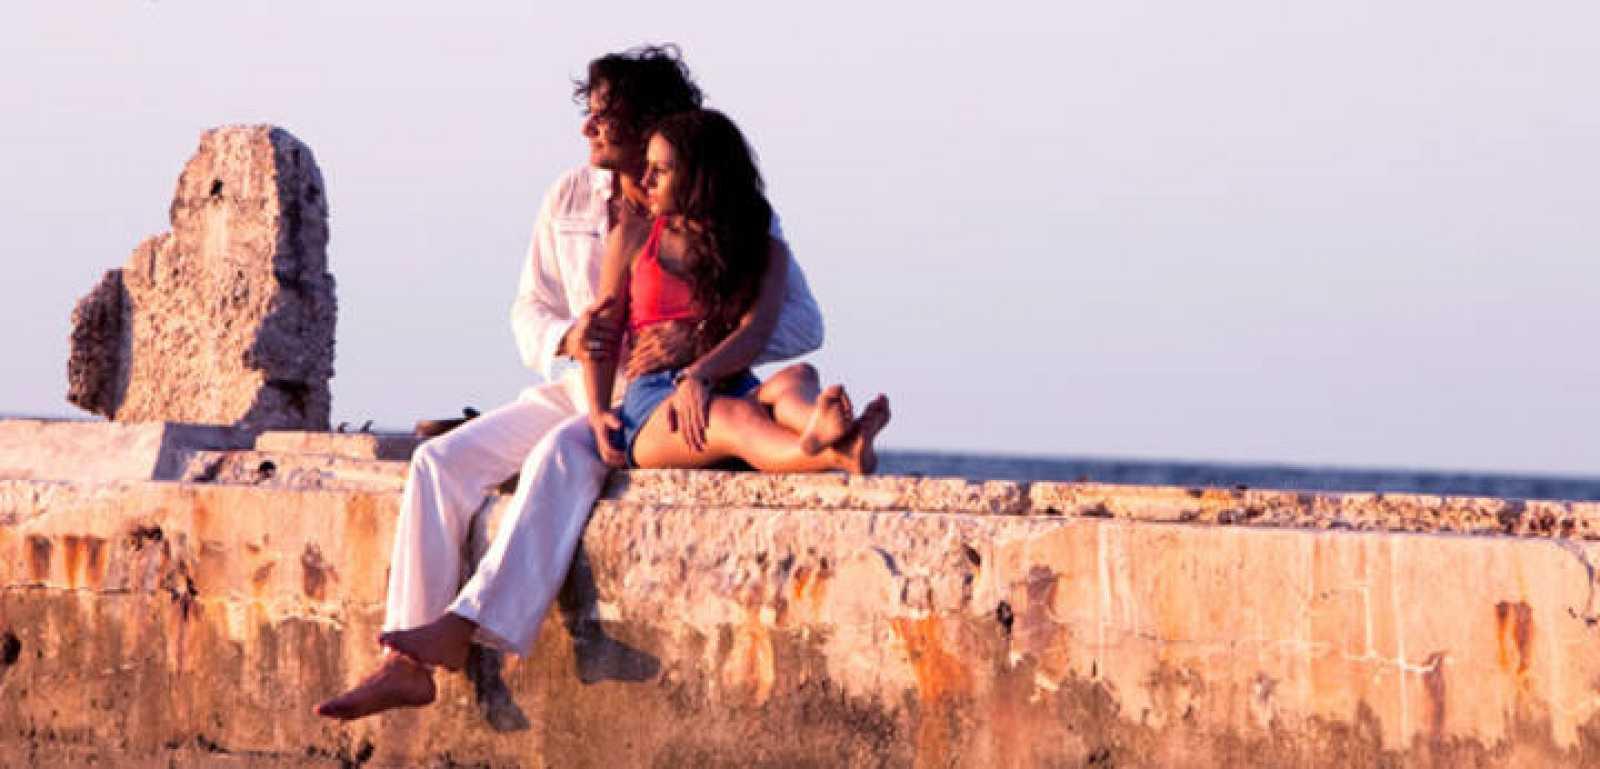 Mar de amor sinopsis rtve playa escondida altavistaventures Images